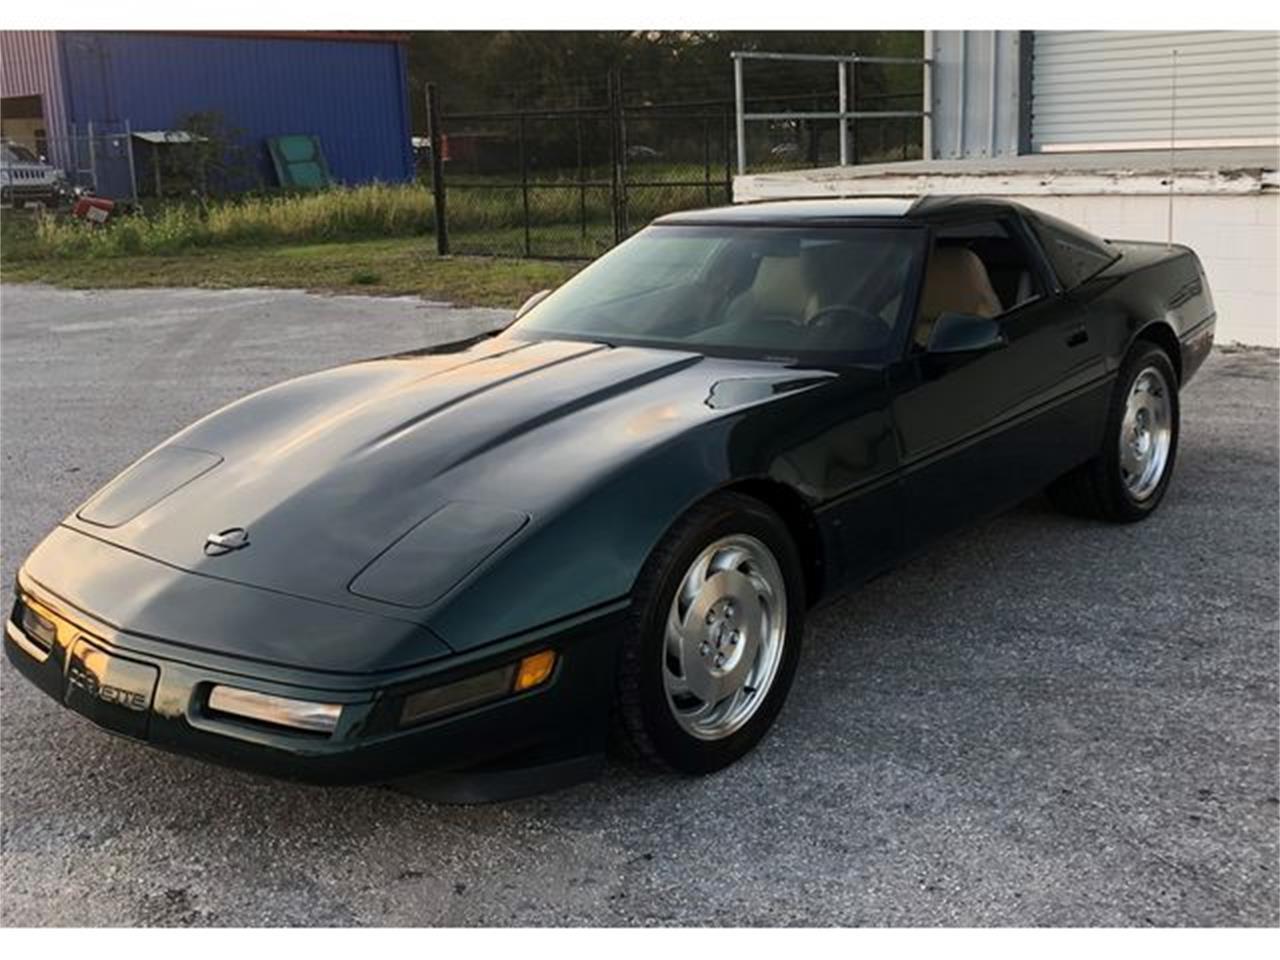 1996 Chevrolet Corvette (CC-1322224) for sale in Lakeland, Florida